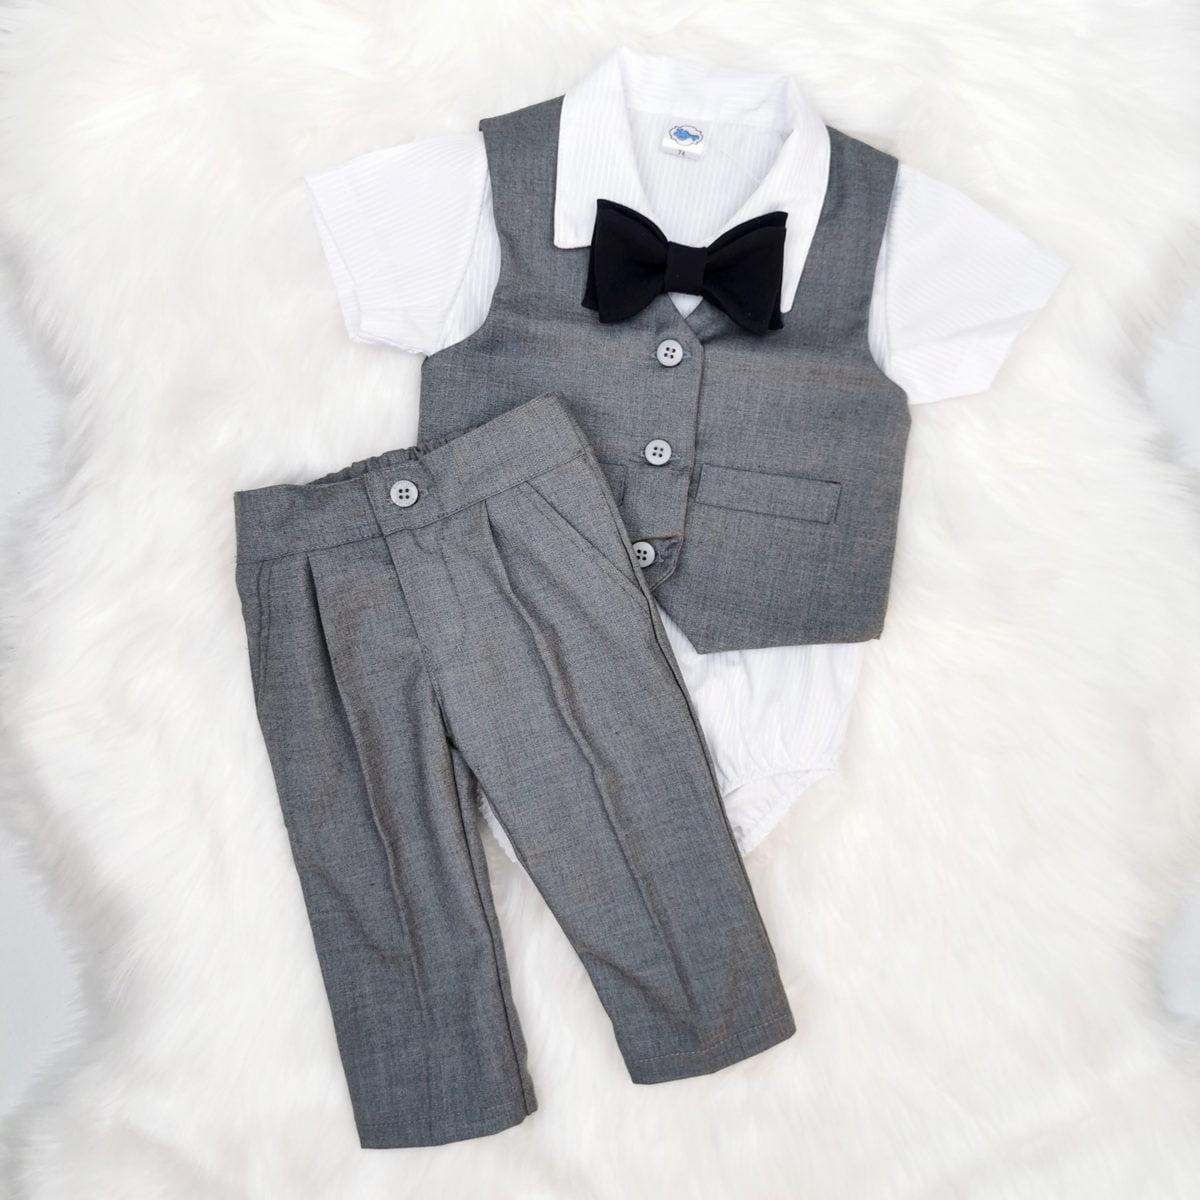 sivo ljetno odijelo za bebe za krštenje